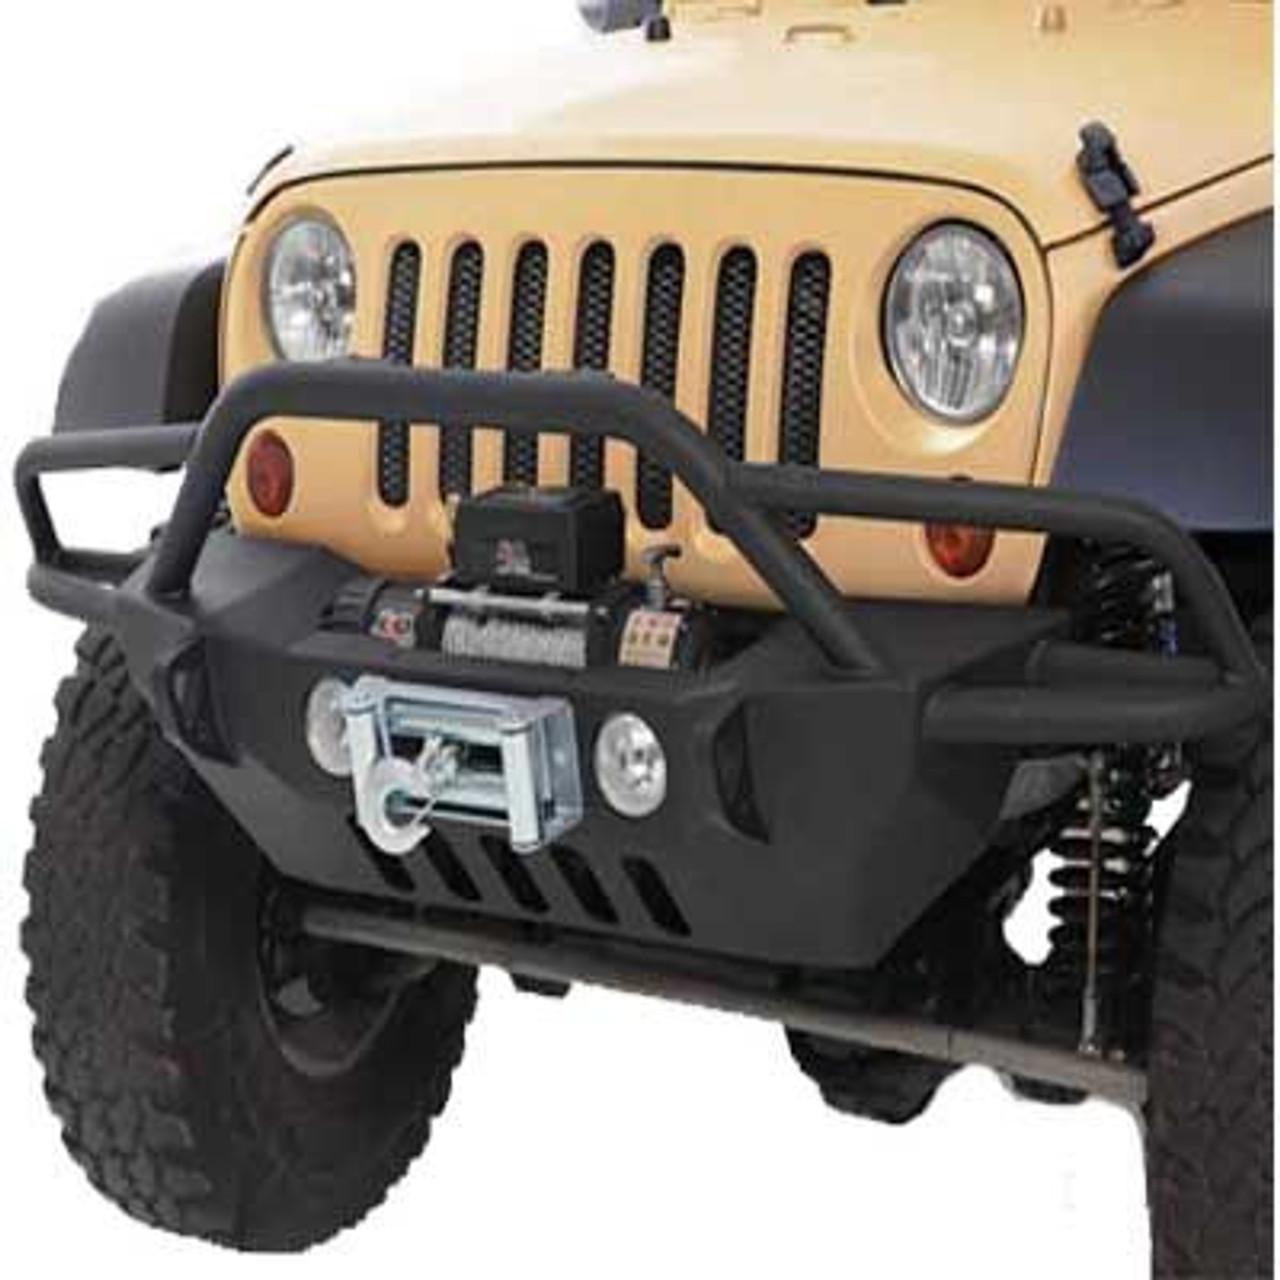 Smittybilt SRC Gen 2 Front Winch Bumper Mounted on Jeep JK